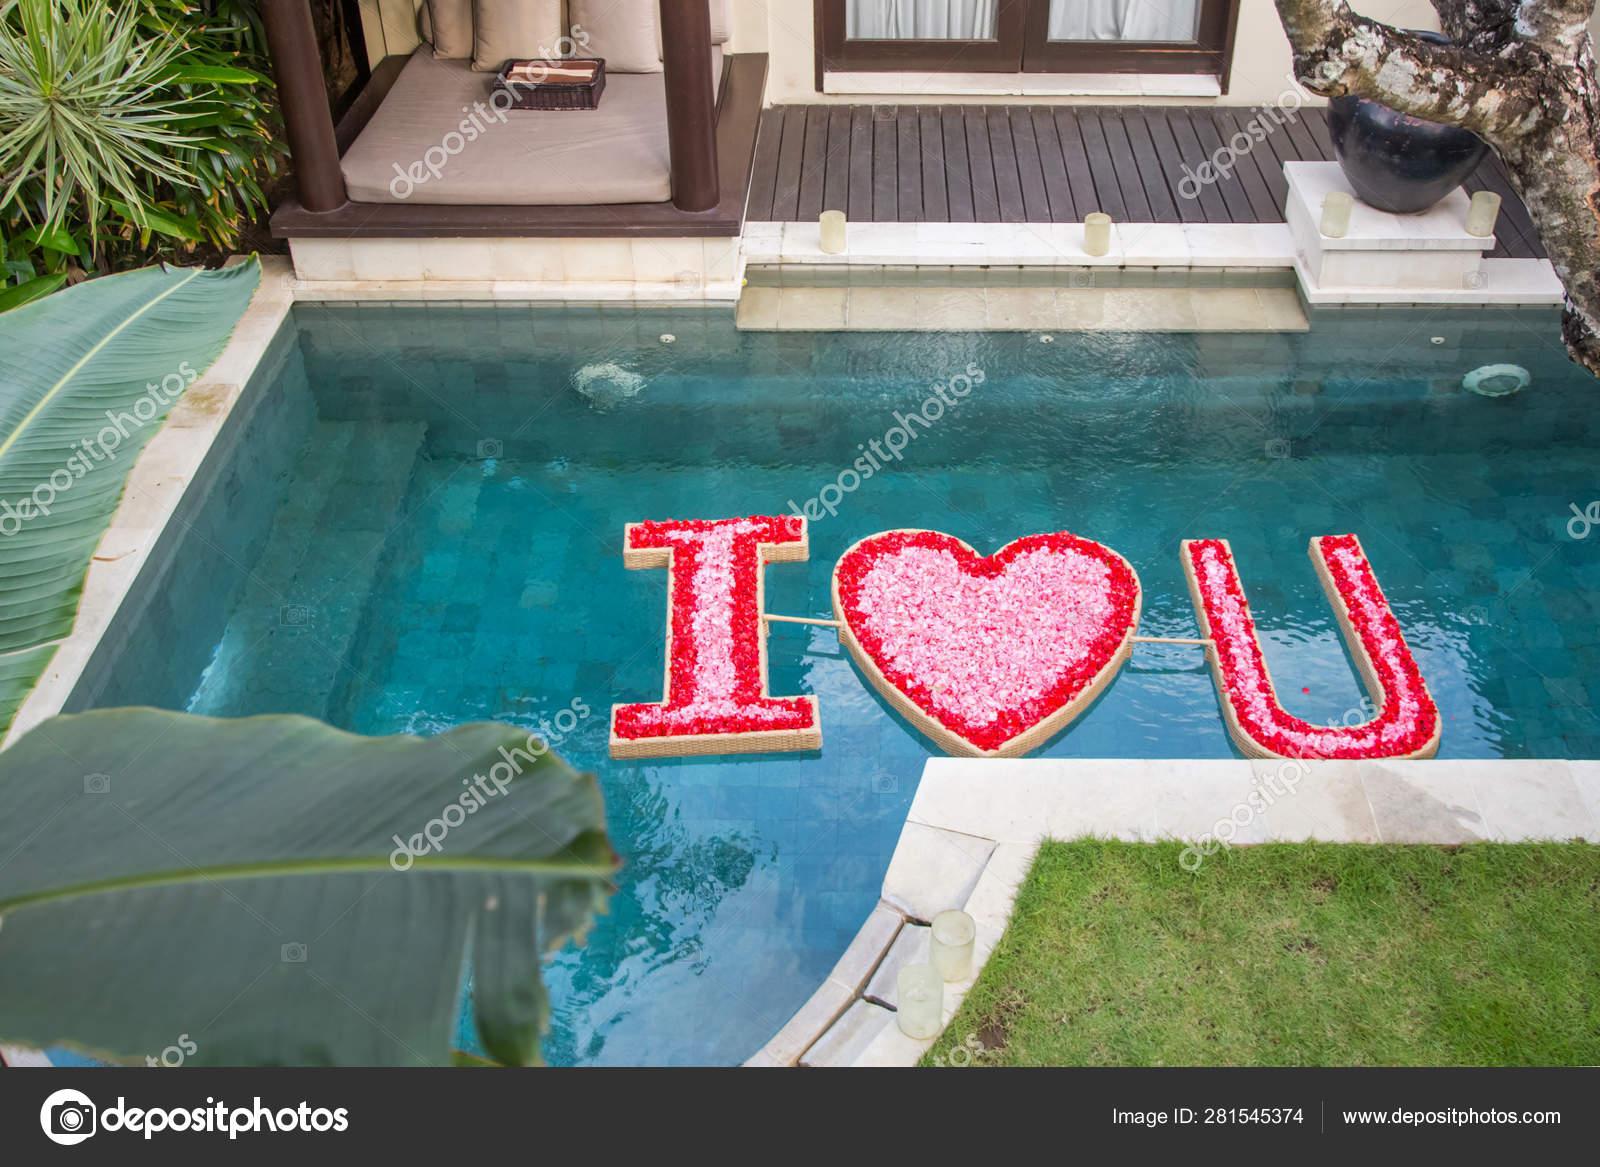 Floating Flowers Arrangement Swimming Pool Honeymoon Birthday Wedding Anniversary Decoration Stock Photo C Triocean2011 281545374